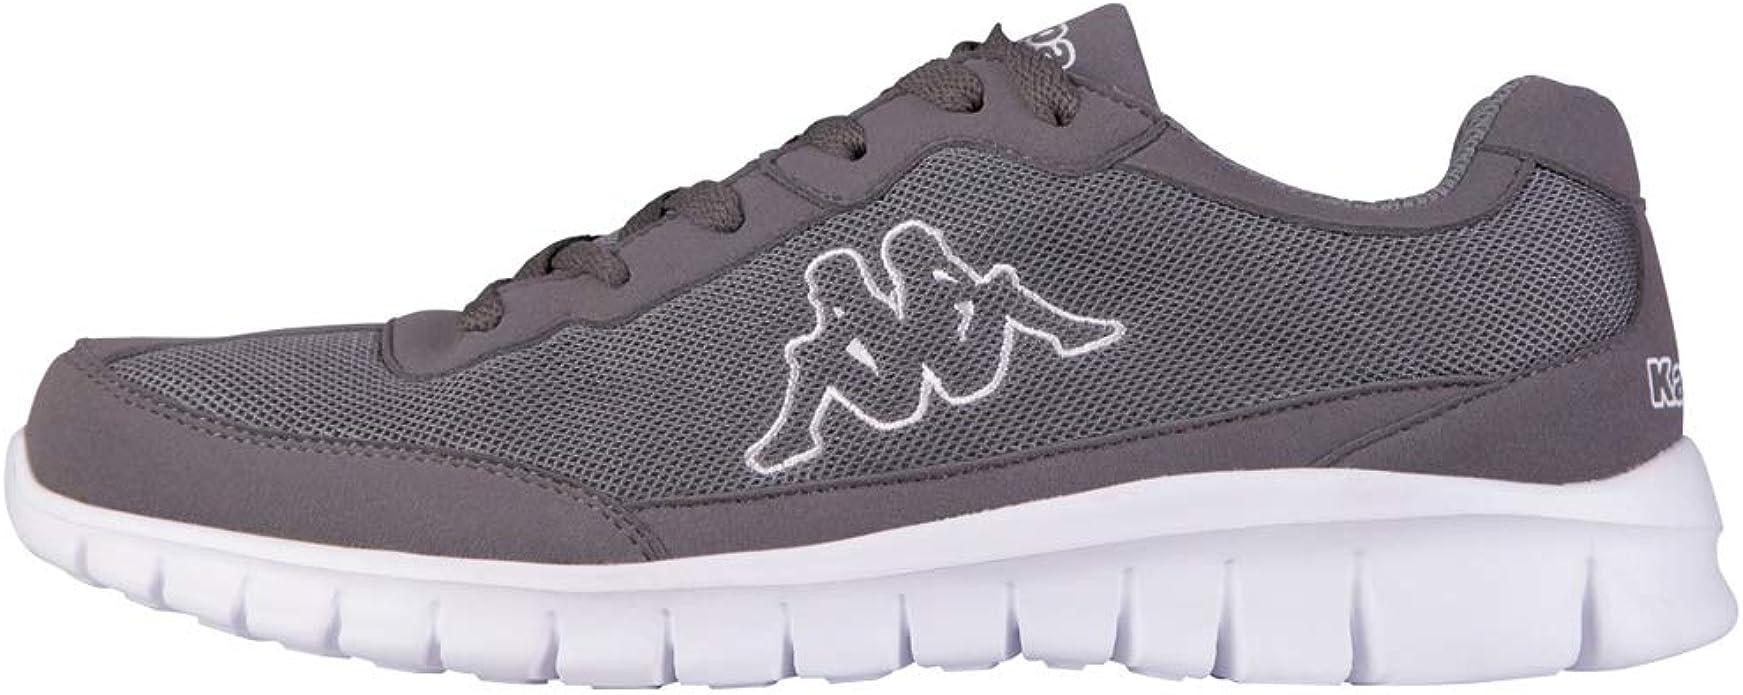 Kappa Rocket Sneakers Fitnesschuhe Damen Herren Unisex Grau